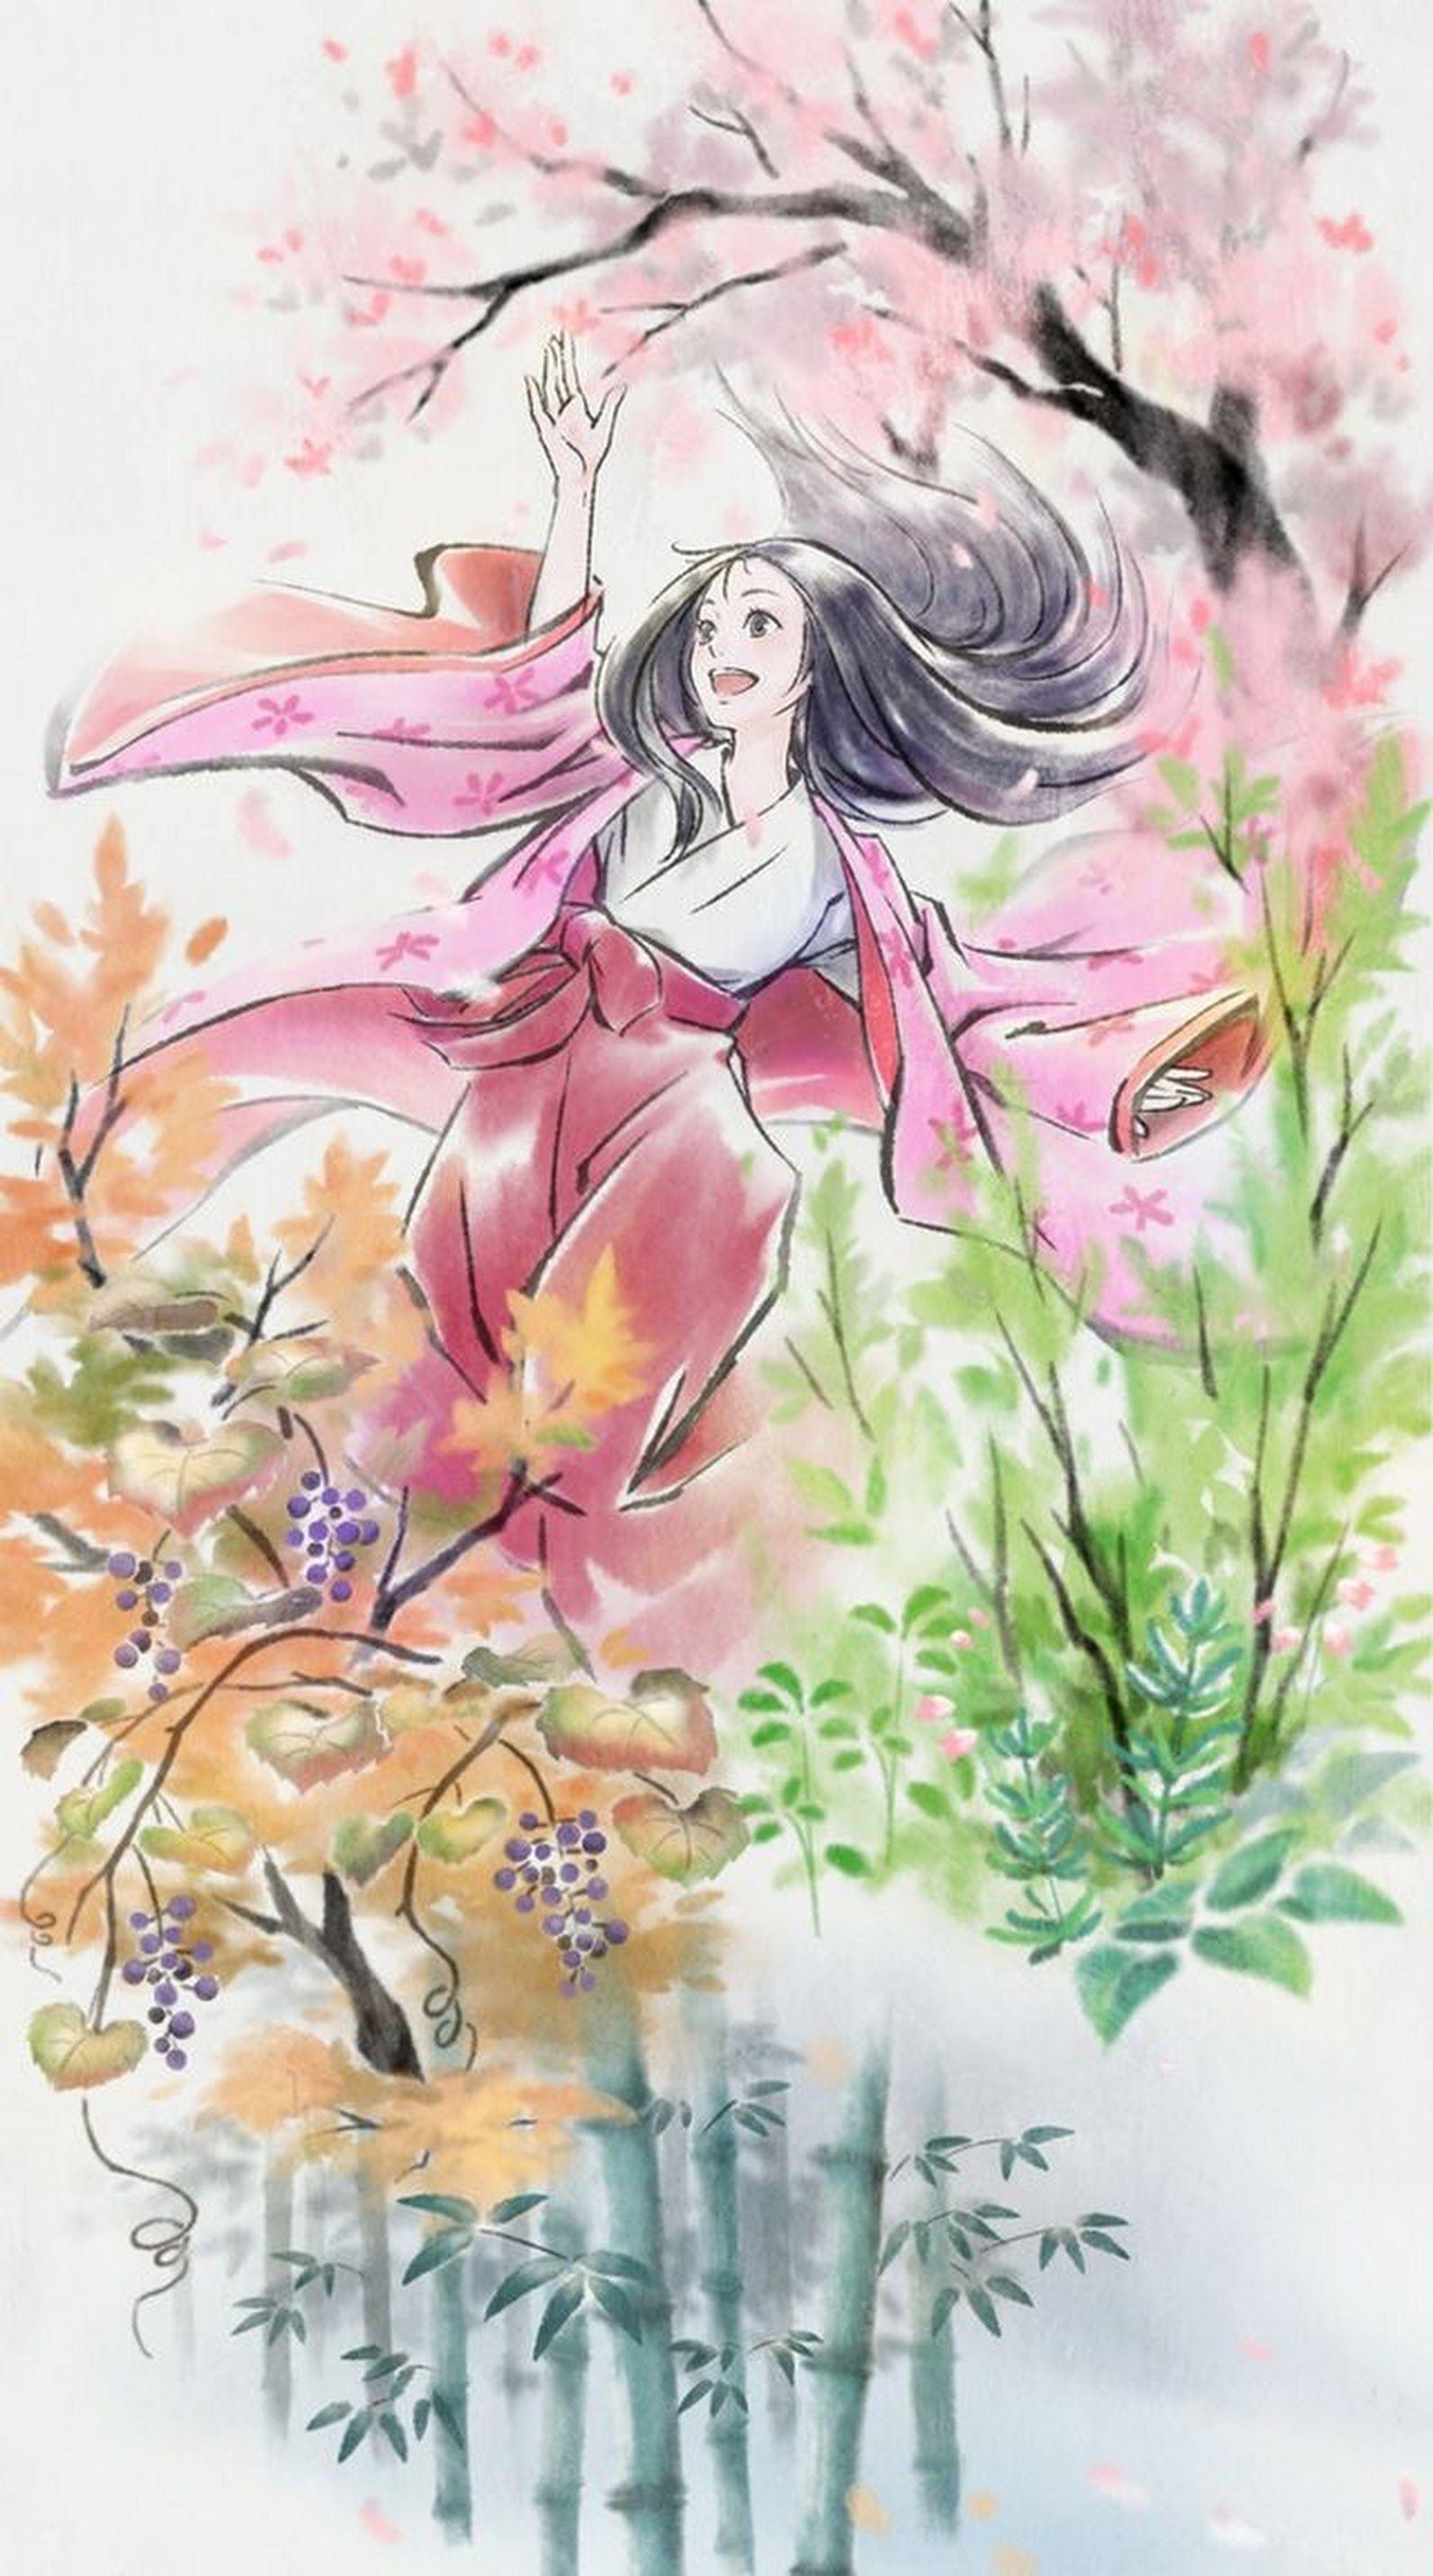 Ghibli S Prinzessin Kaguya Https Www Zerochan Net Pixiv Id 2846705 ジブリ イラスト ジブリ作品 イラスト